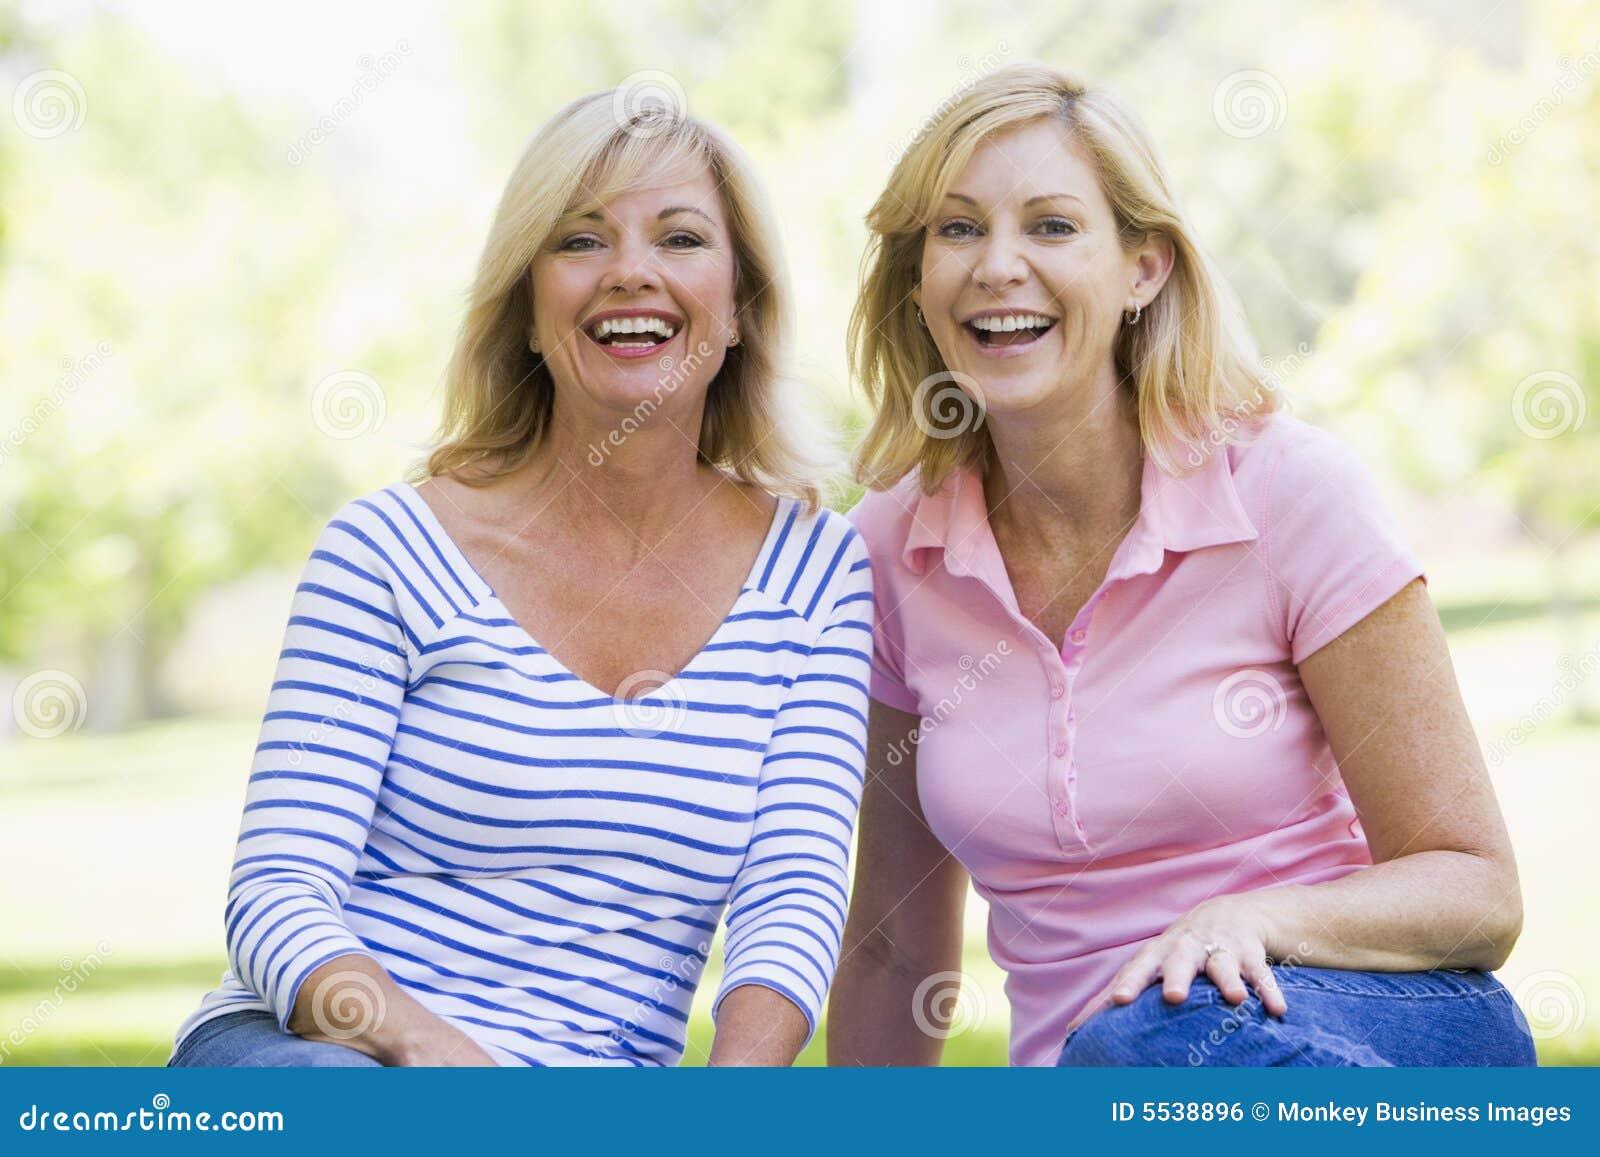 Two women pics 86